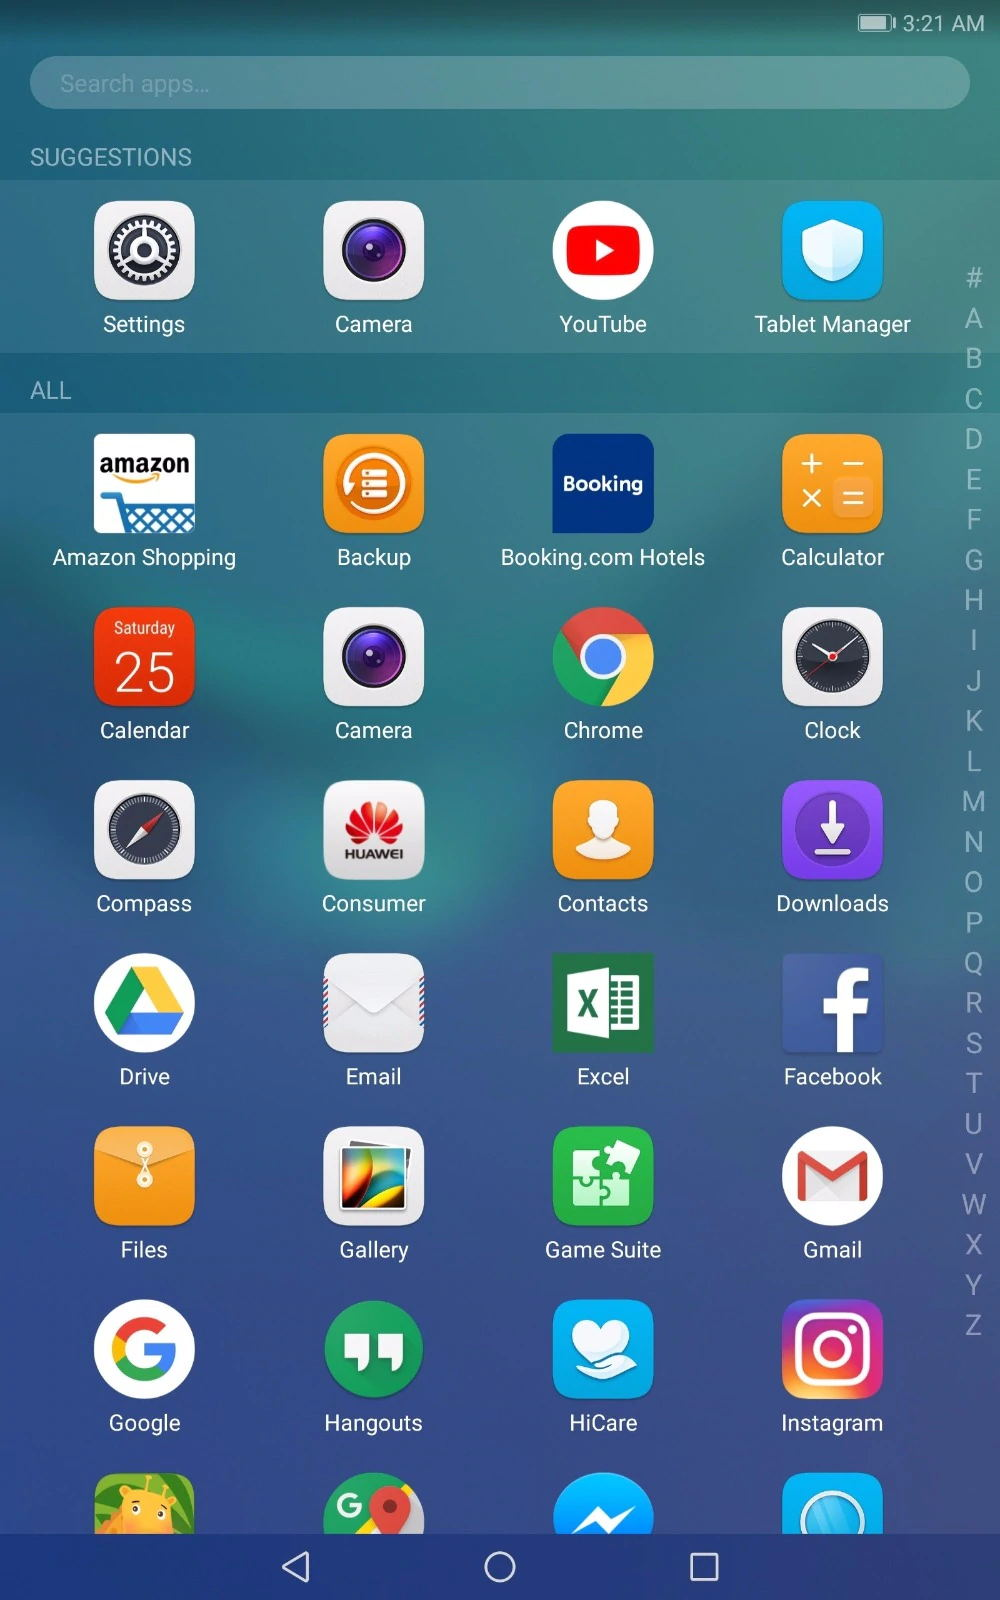 huawei m6 lte bluetooth wifi tablet